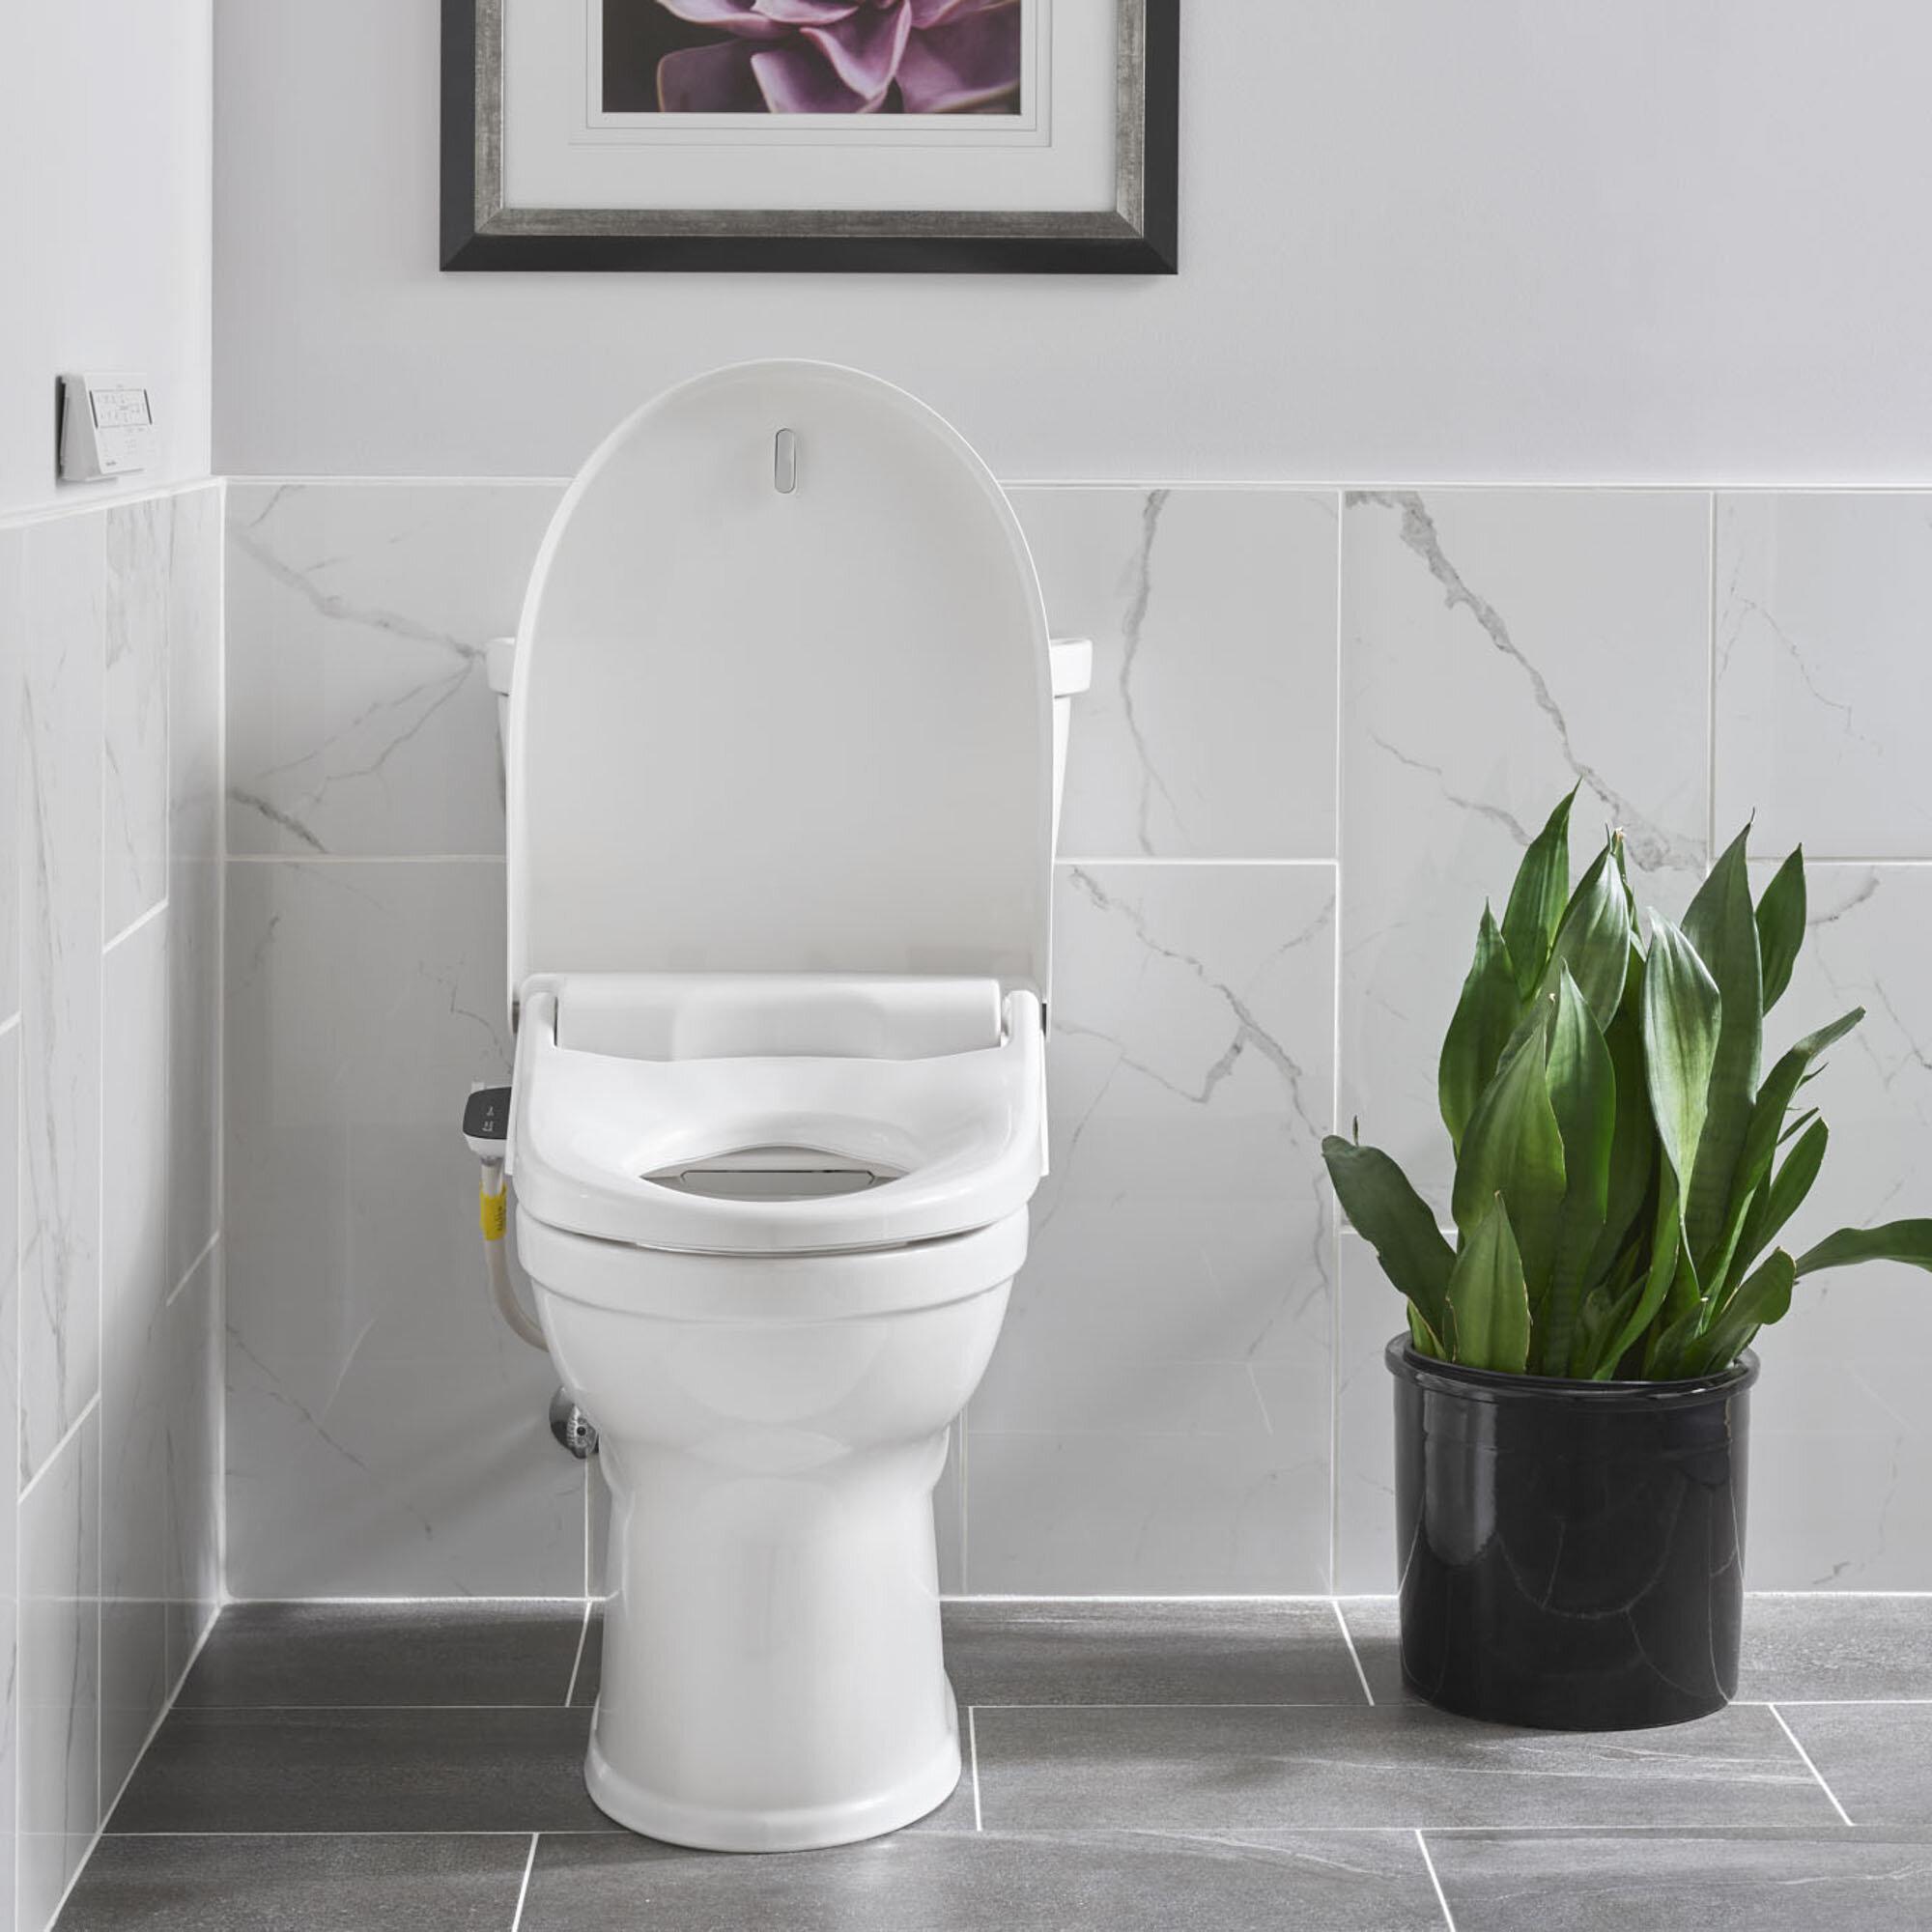 Superb Advanced Clean Spalet Elongated Toilet Seat Bidet Bralicious Painted Fabric Chair Ideas Braliciousco